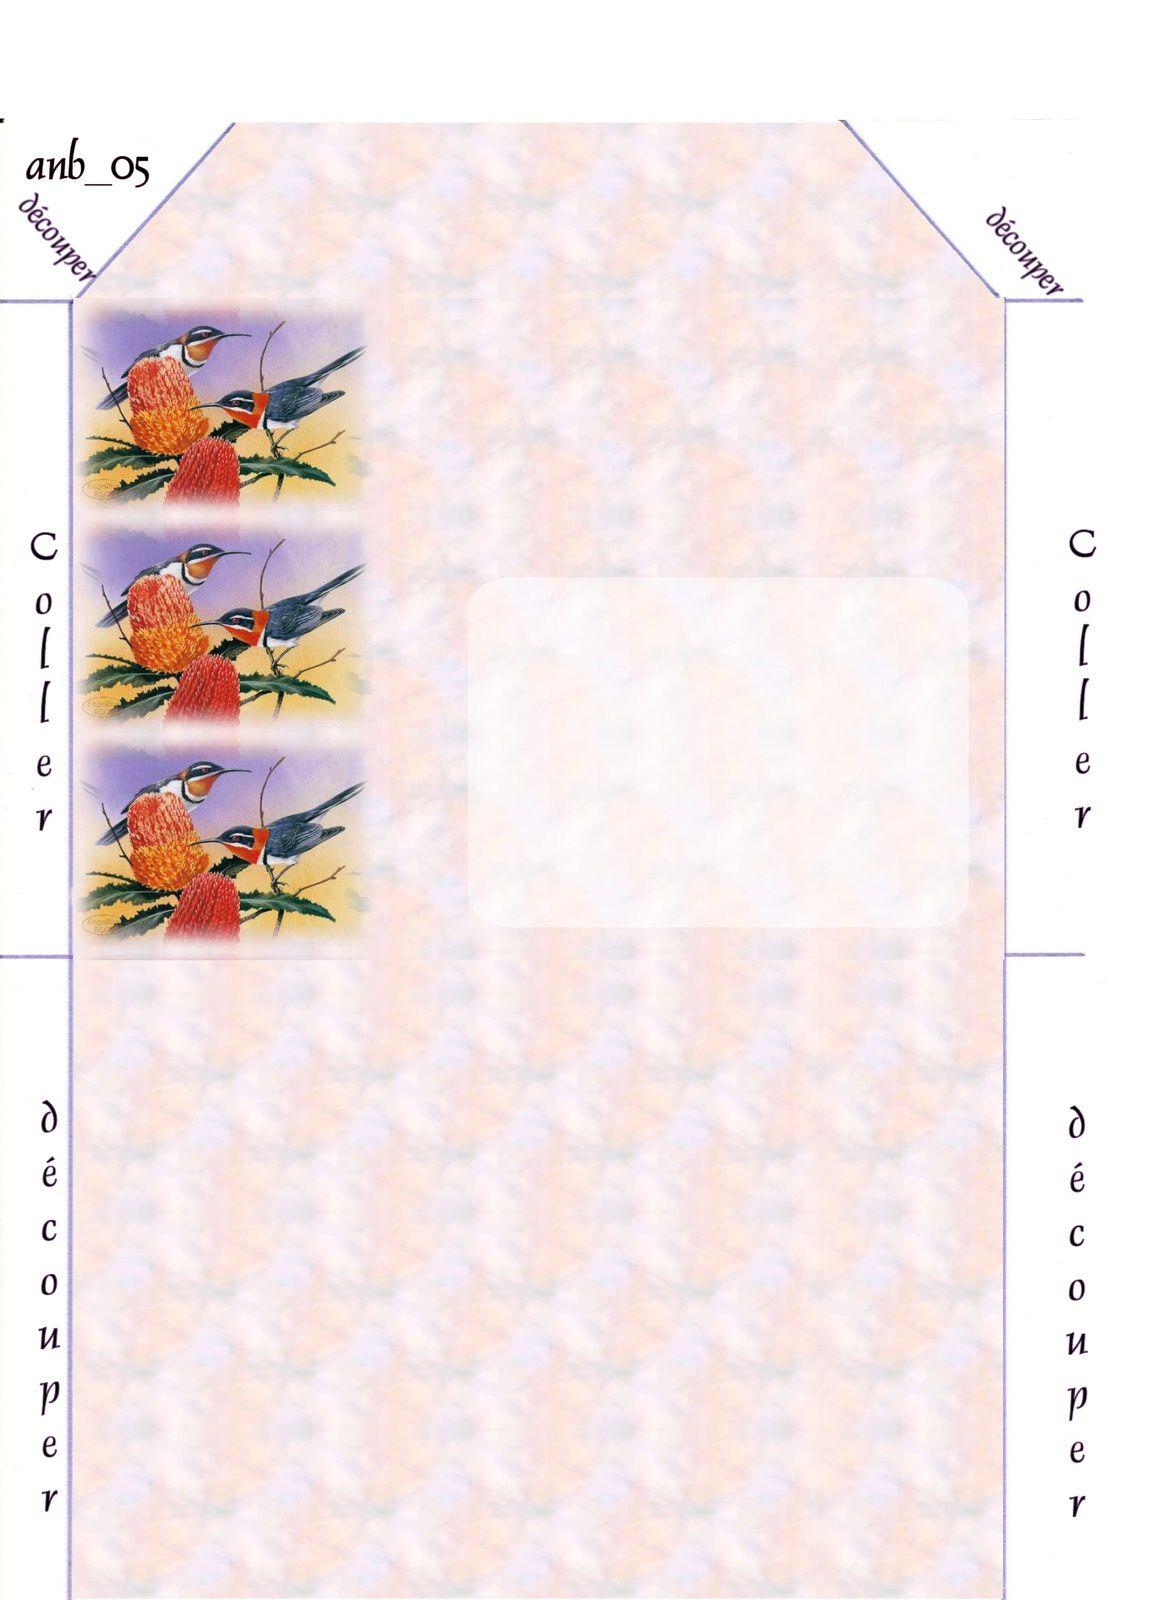 Oiseaux Incredimail &amp&#x3B; Papier A4 h l &amp&#x3B; outlook &amp&#x3B; enveloppe &amp&#x3B; 2 cartes A5 &amp&#x3B; signets 3 langues    kb_shepherd_eric_12_western_spinebills